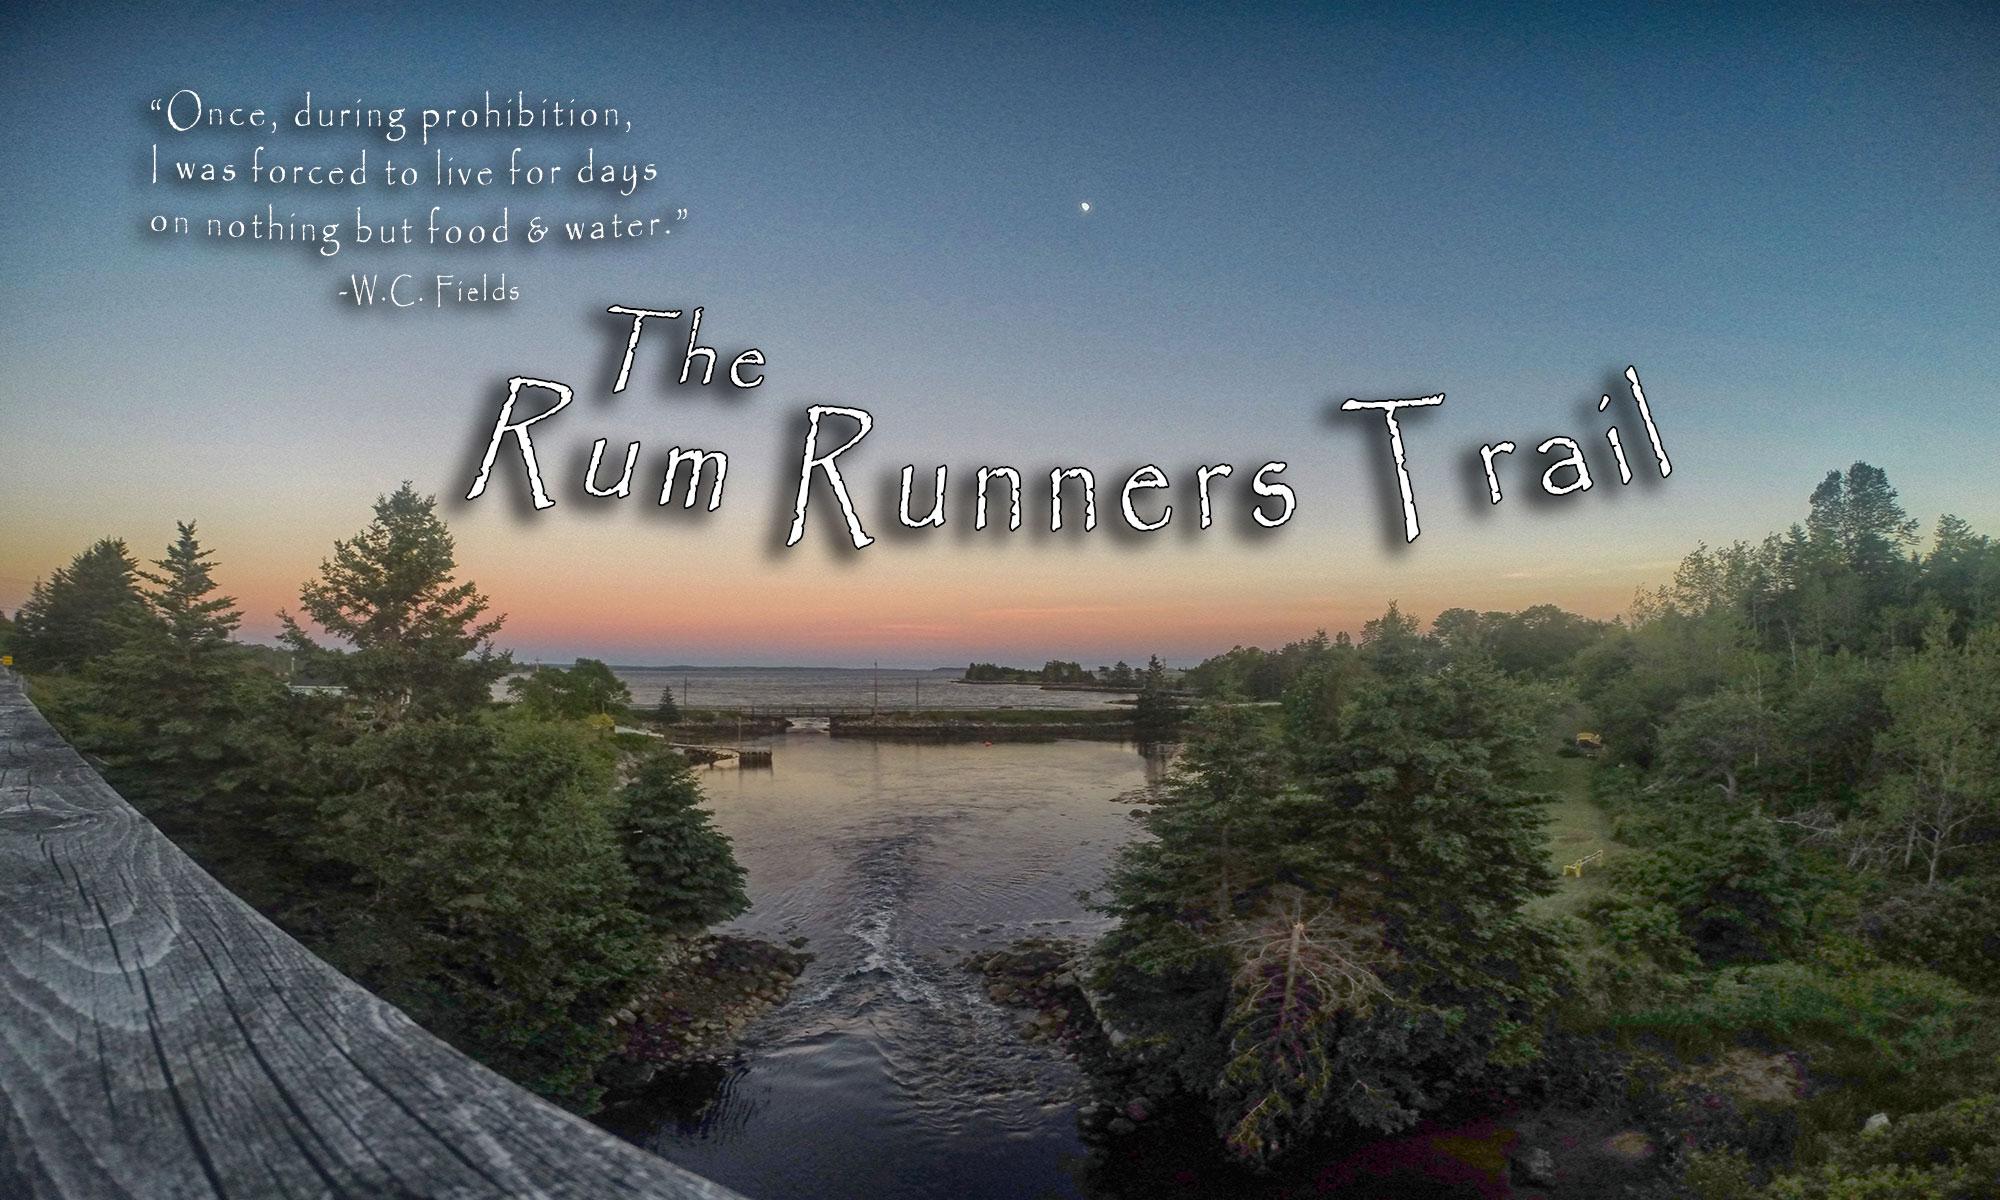 Rum Runners Trail